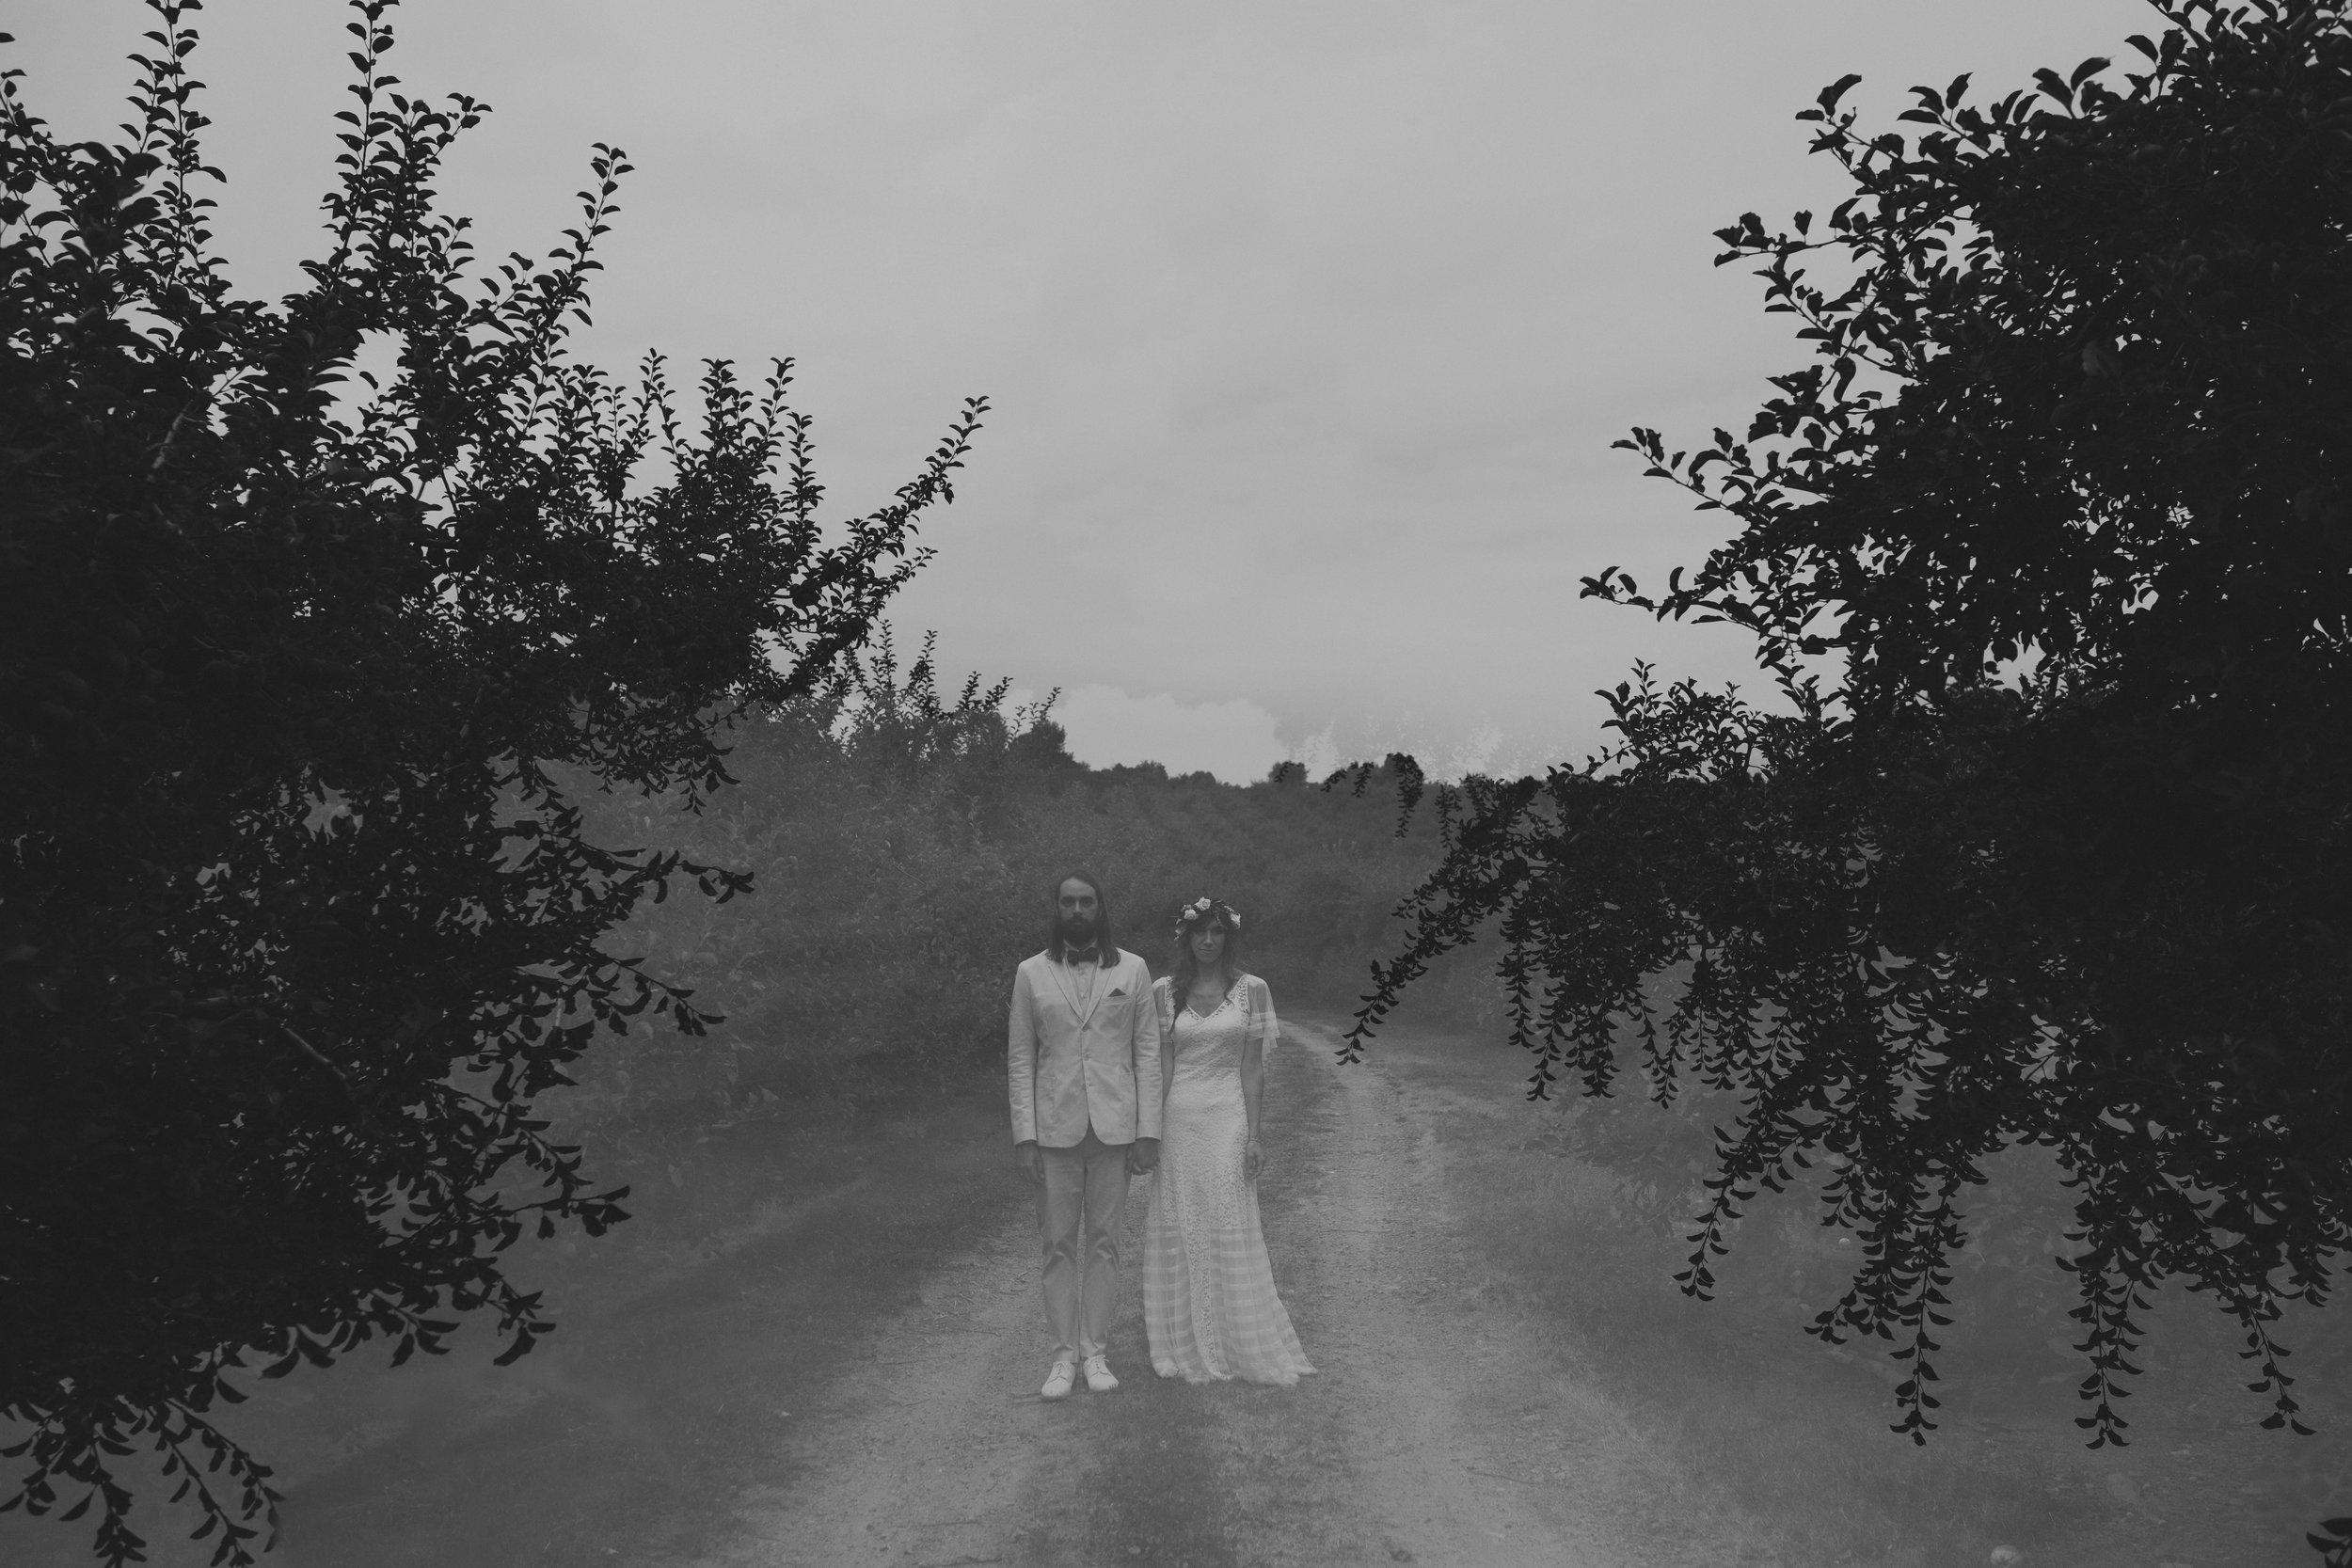 LIBERTY_VIEW_FARM_HIGHLAND_NY_WEDDING_CHELLISE_MICHAEL_PHOTOGRAPHY859.JPG